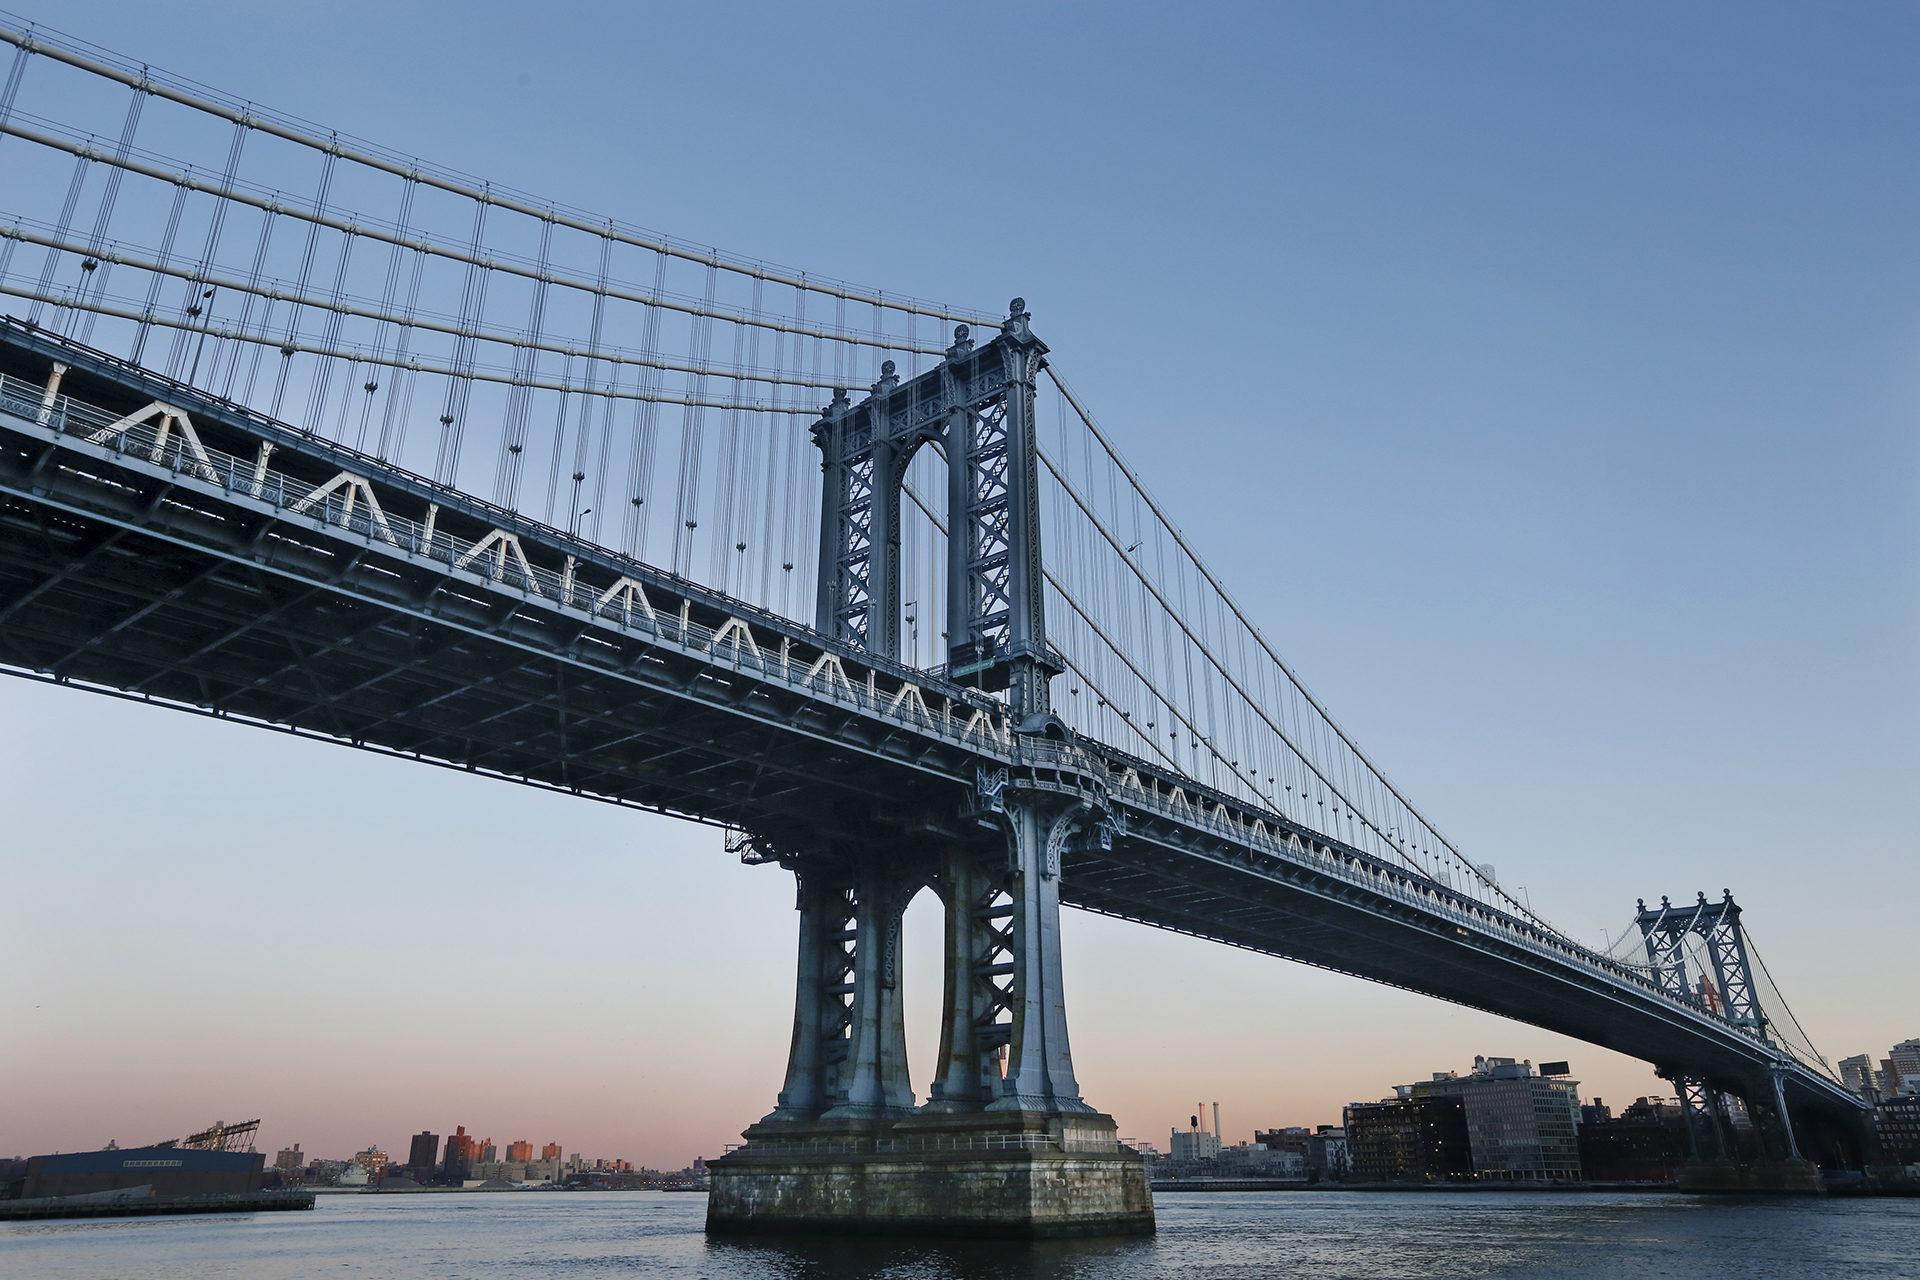 Manhattan Bridge East River New York City